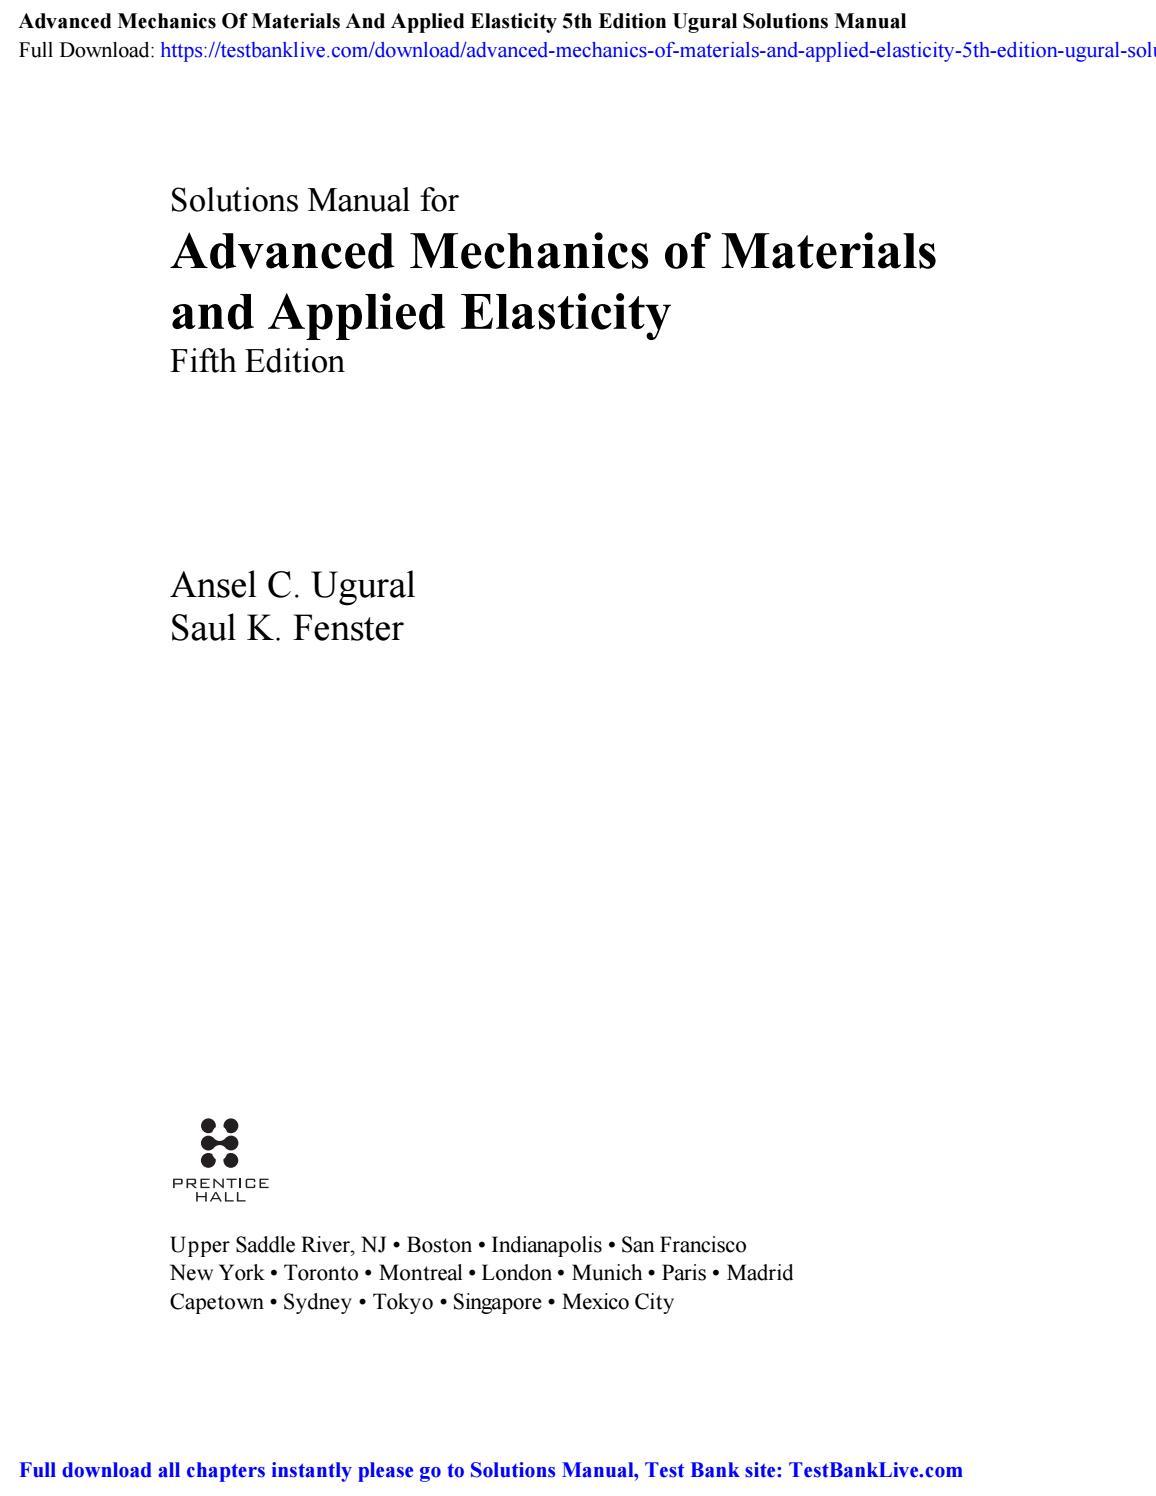 Advanced Mechanics of Materials Science & Math Books ...